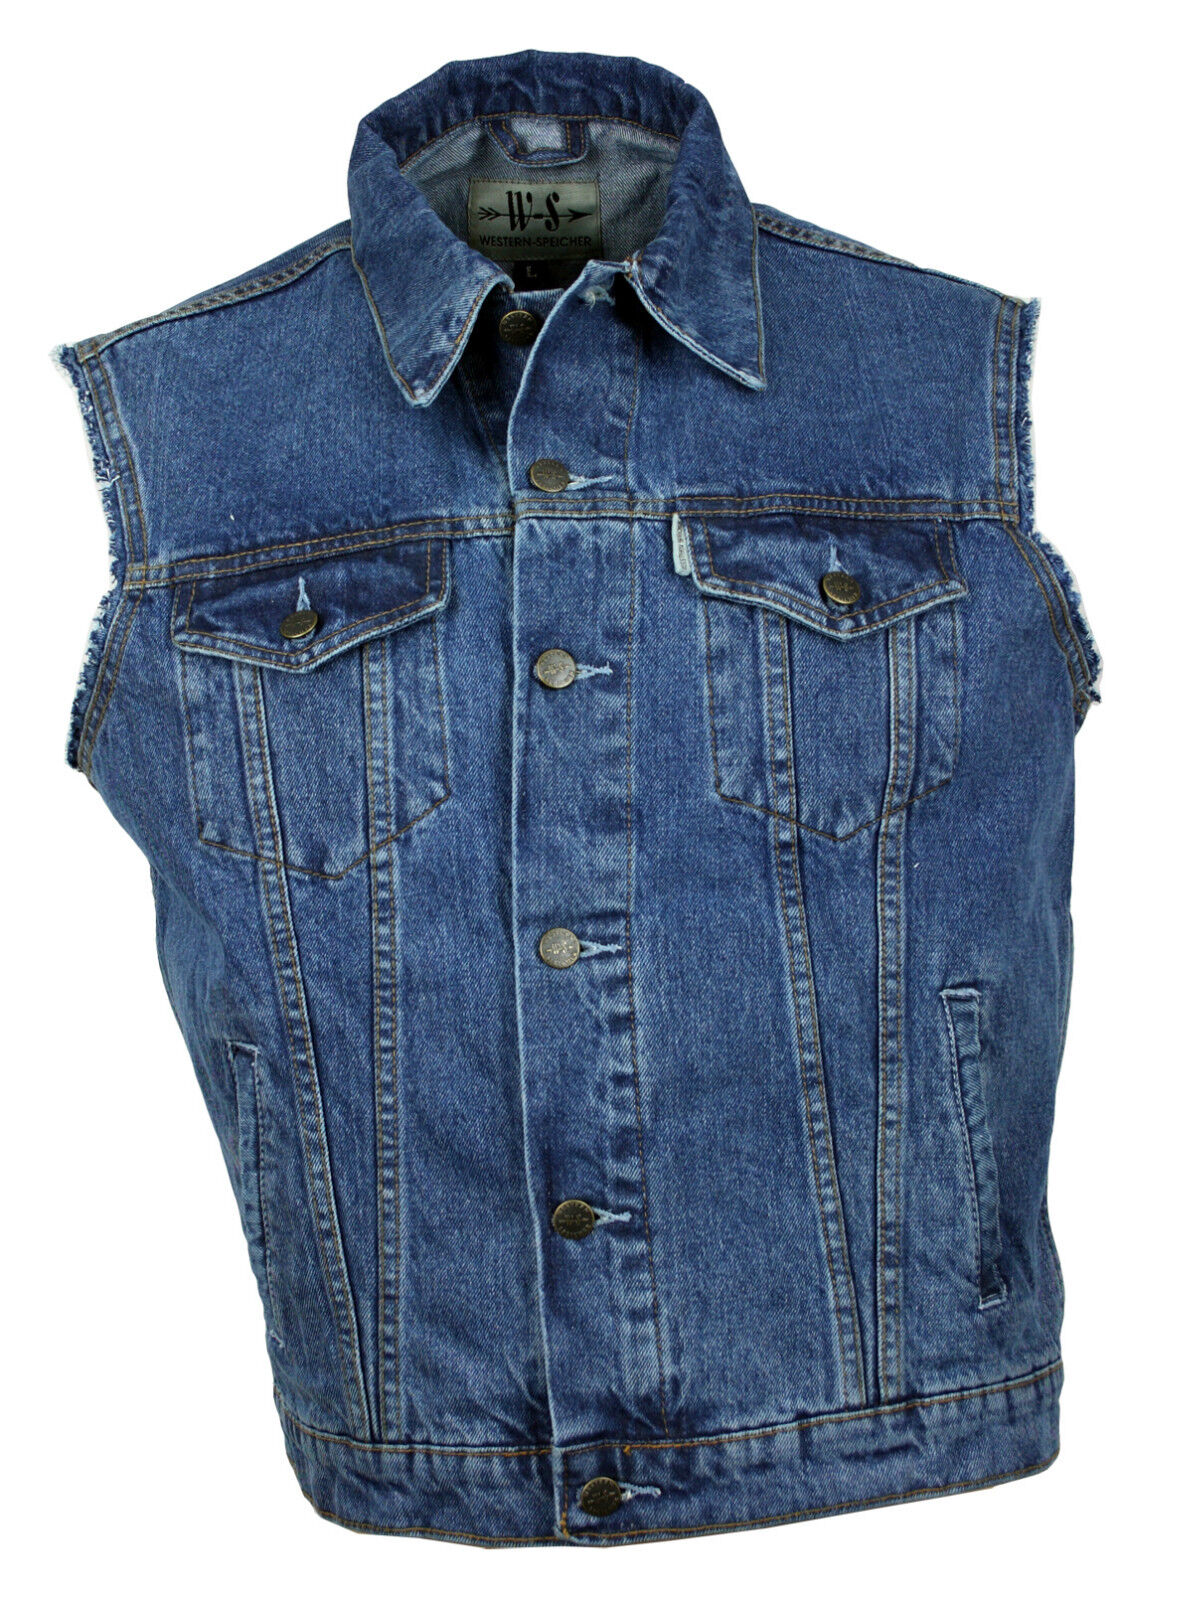 Western-Speicher Jeans Denim Vest Stonewash Cowl Vest Cotton bluee Fringe Size XL